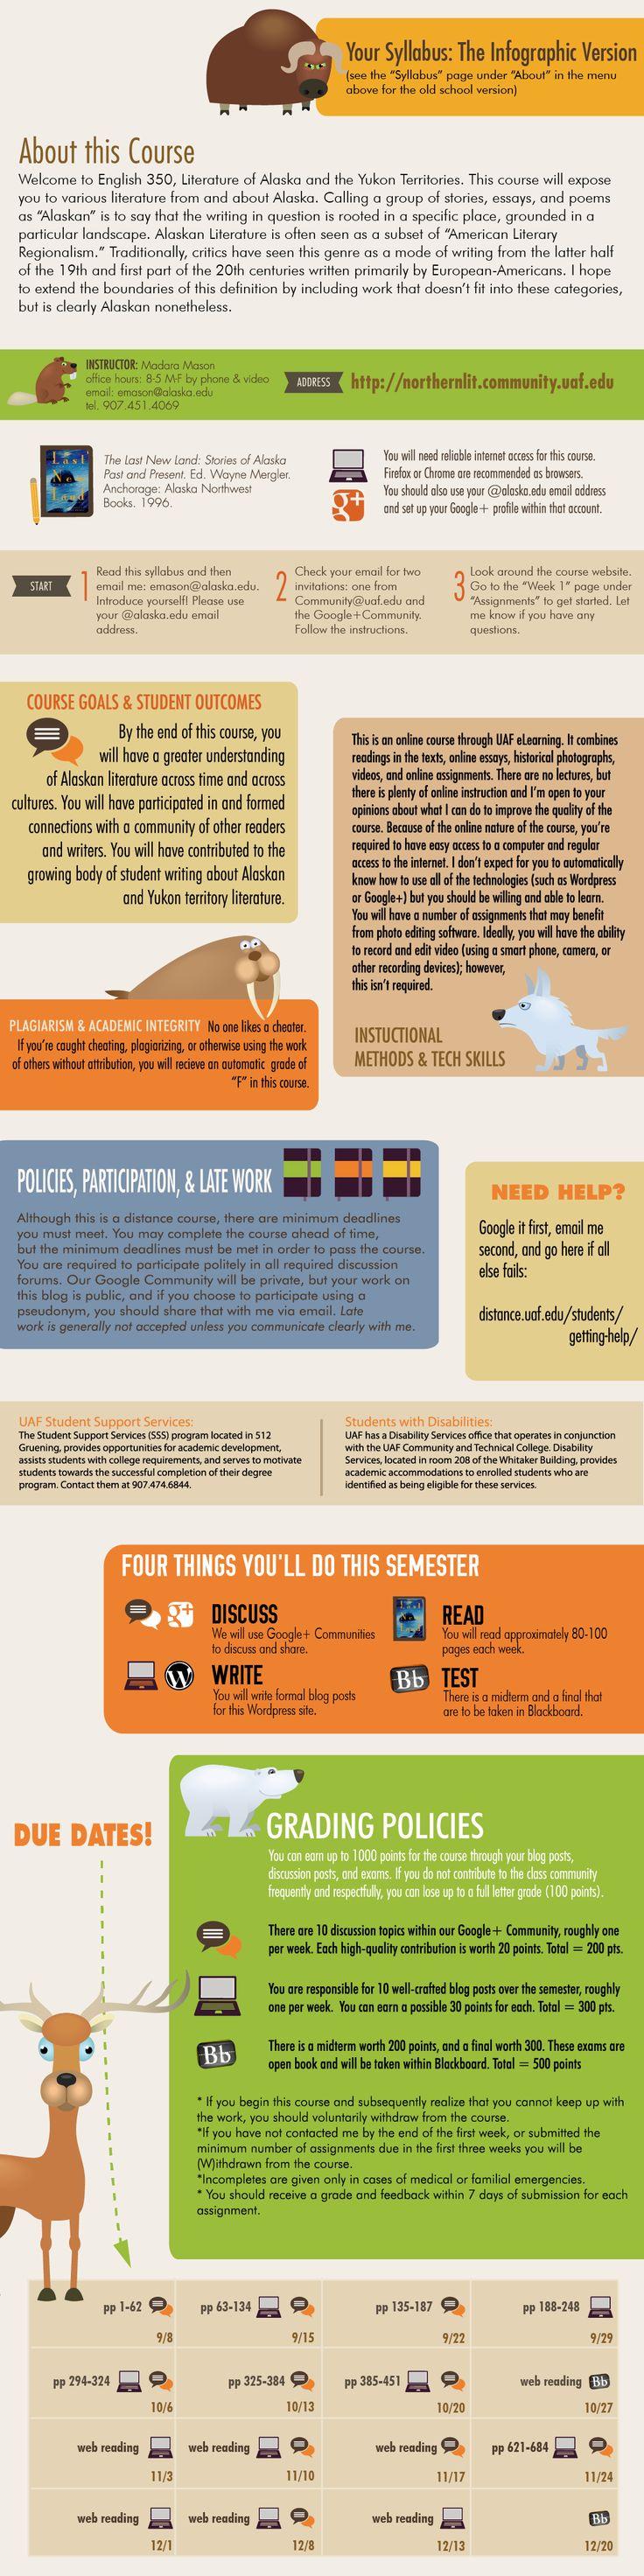 goal for next semester: make an infographic syllabus